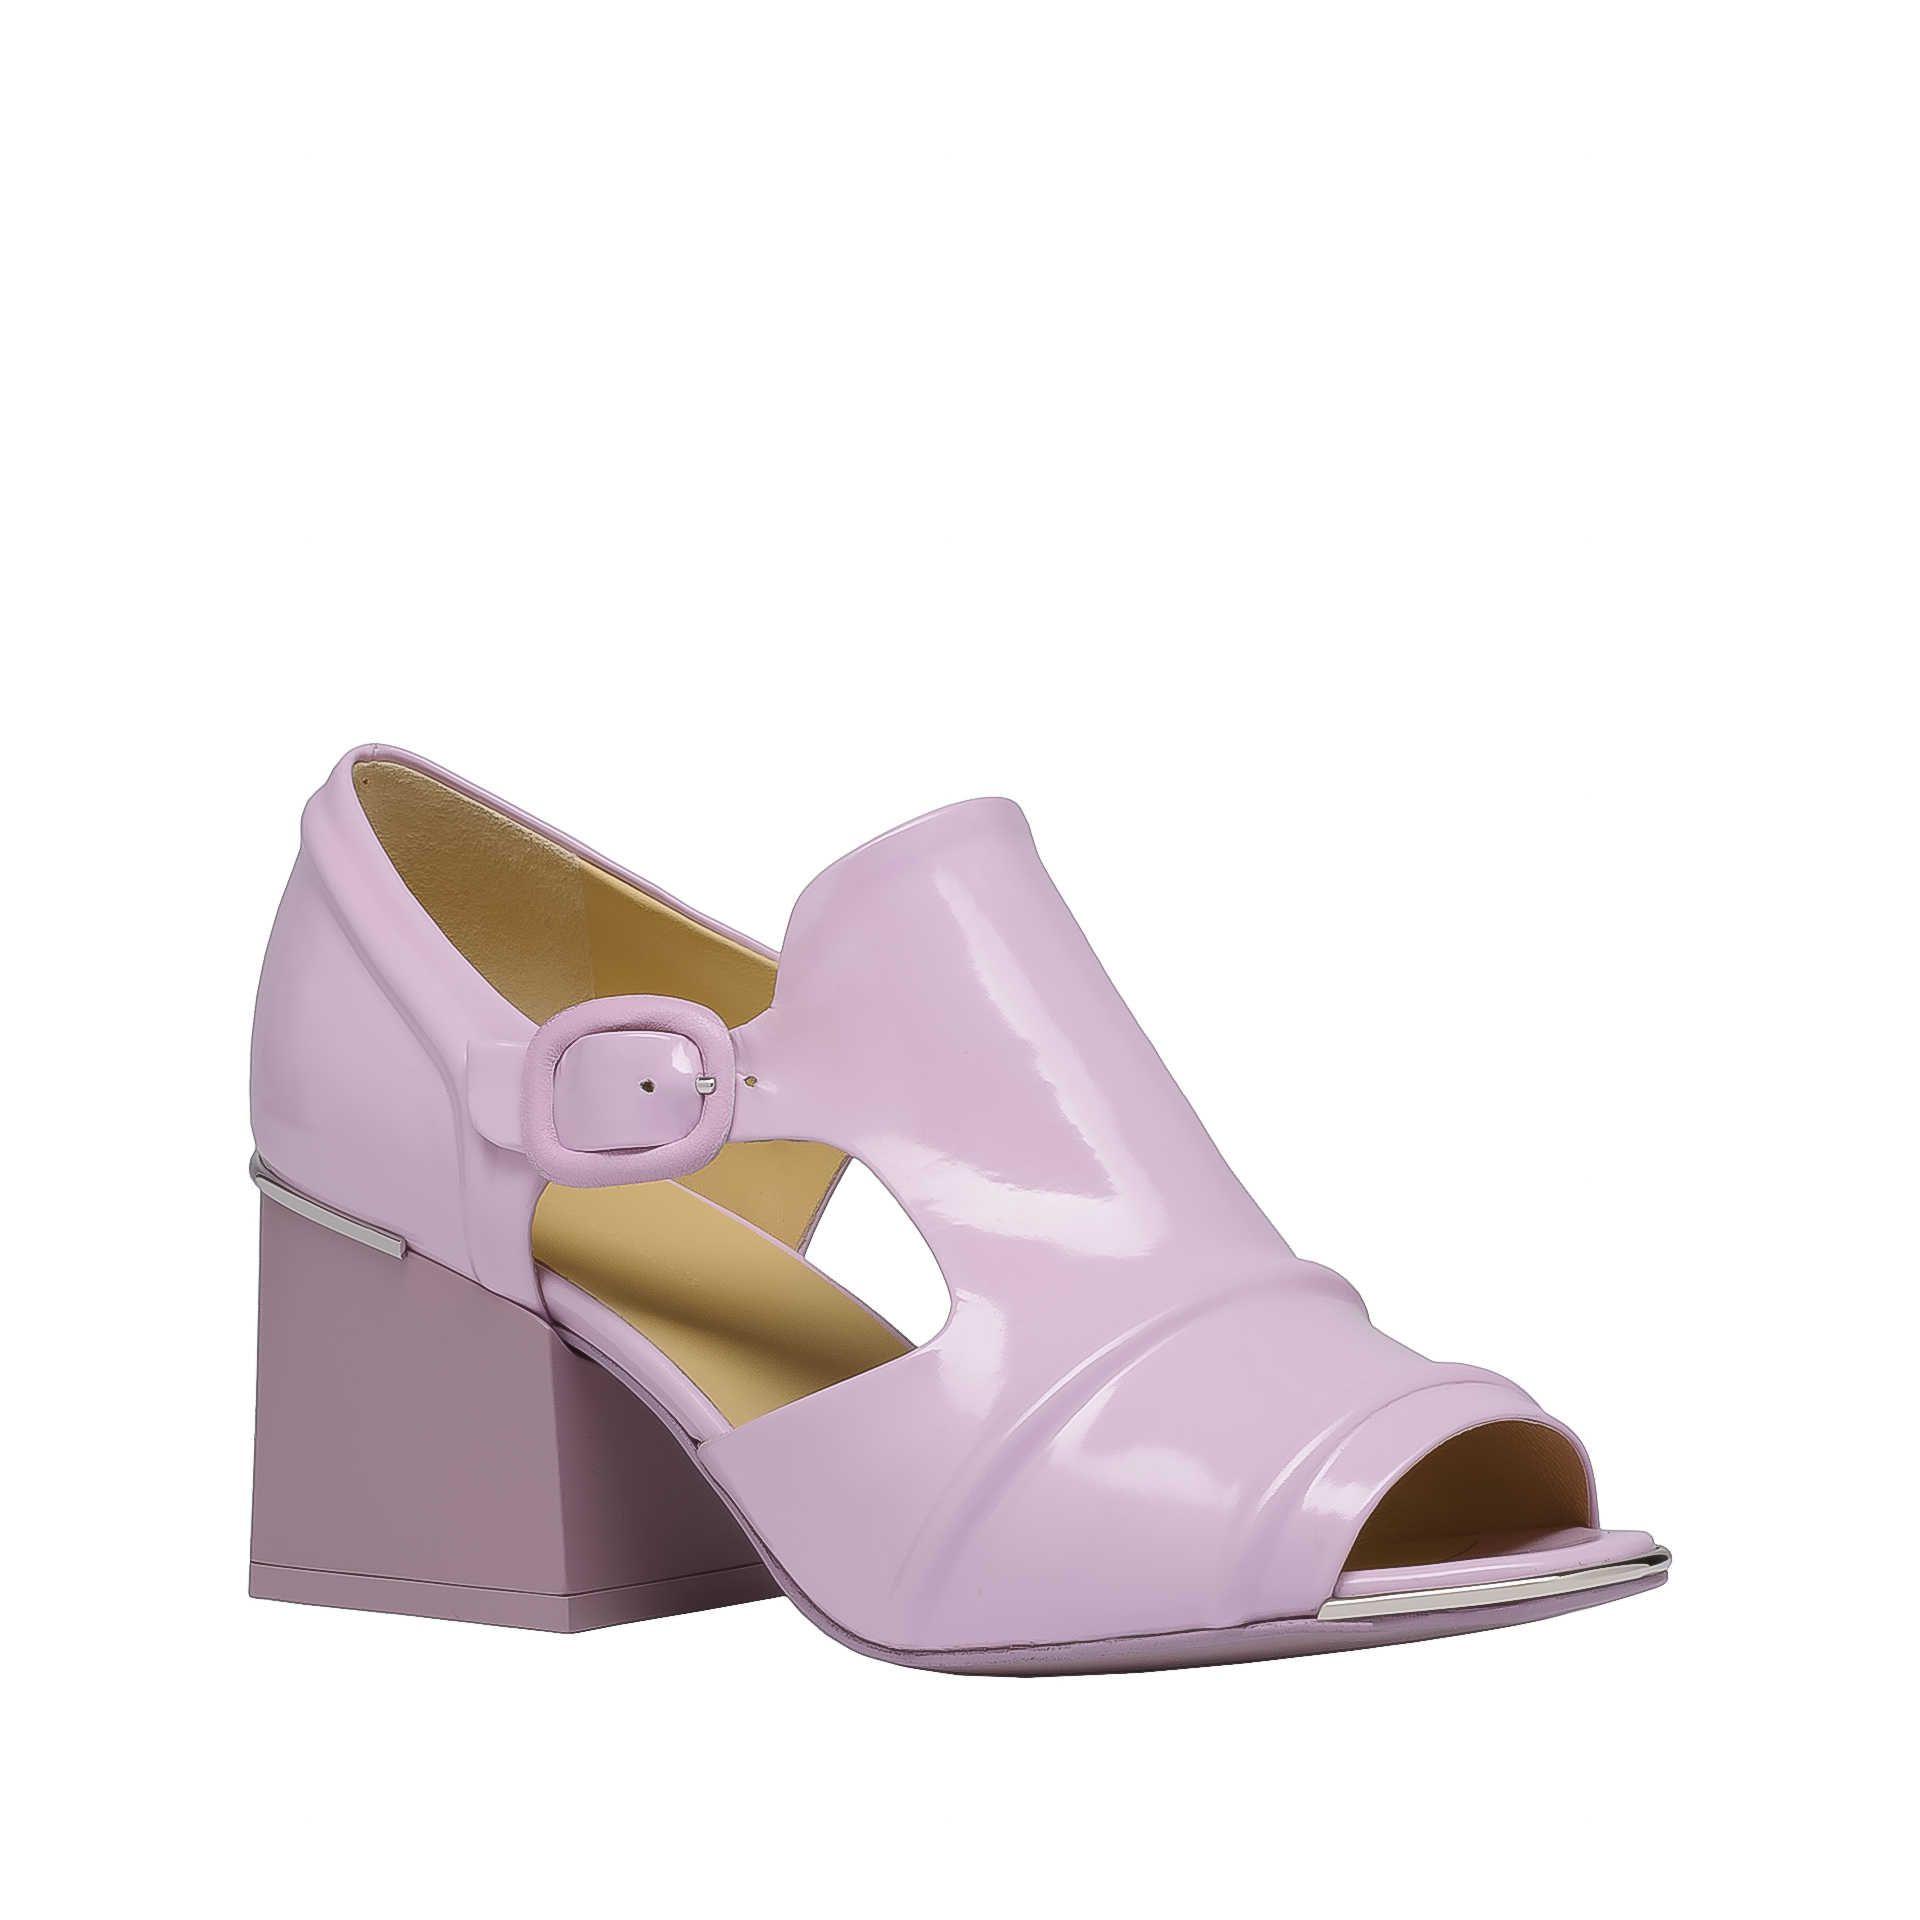 57efd72e00e Pink Balenciaga Cube Open Toe Loafers - Shoess Seasonal - Balenciaga ...